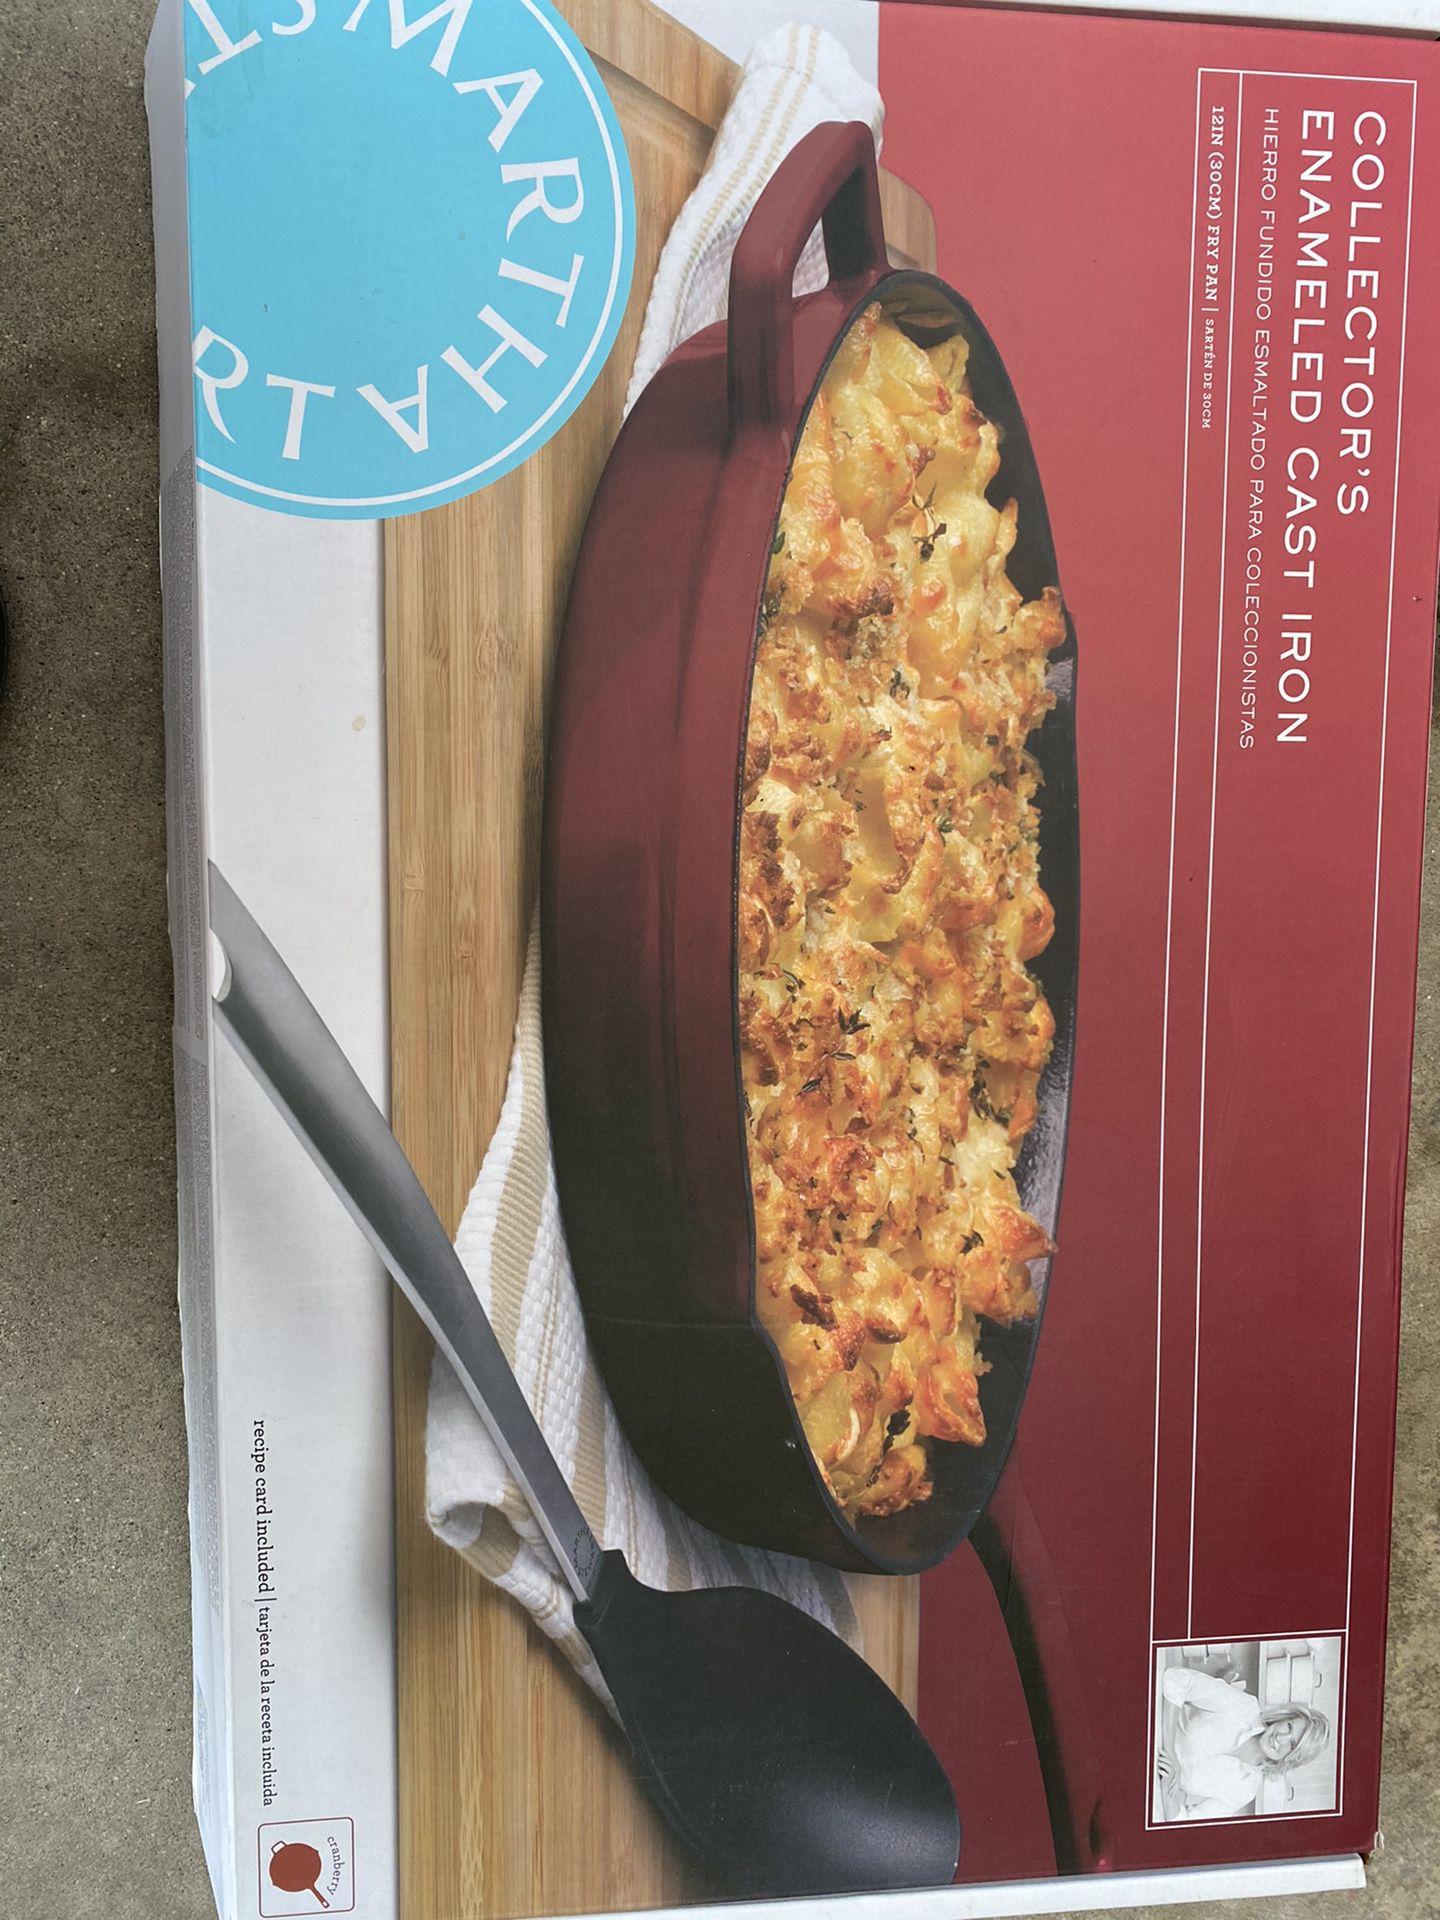 New Martha Stewart cast iron fry pan